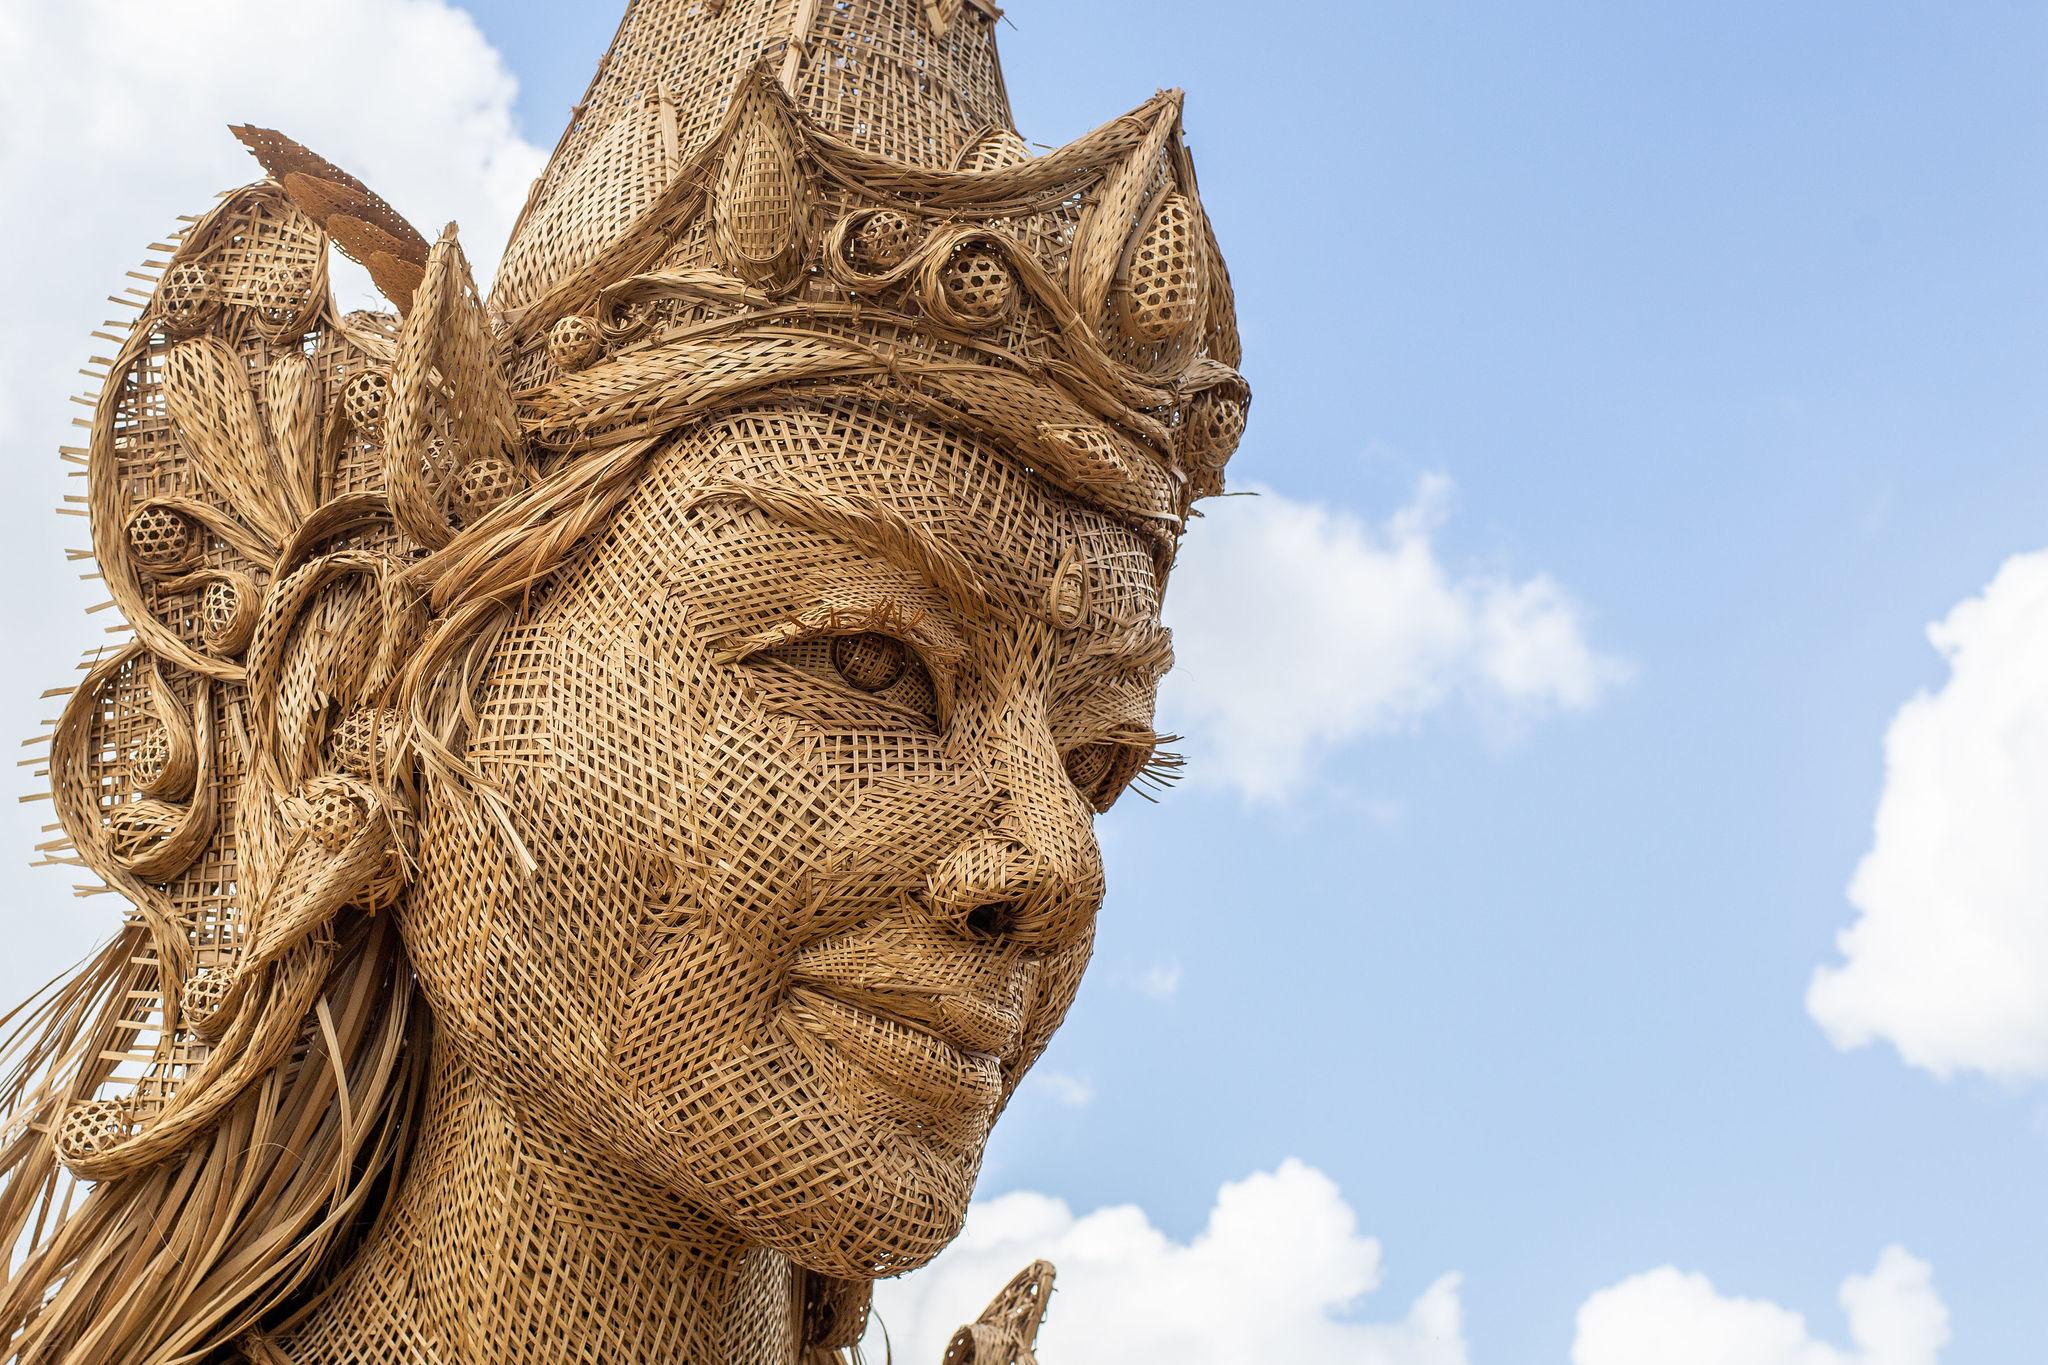 TheWrightLine-Bali-Stills-34-2048x1365-5b882ae8-66d2-4aa7-a6fe-68f749eba6b9.jpg